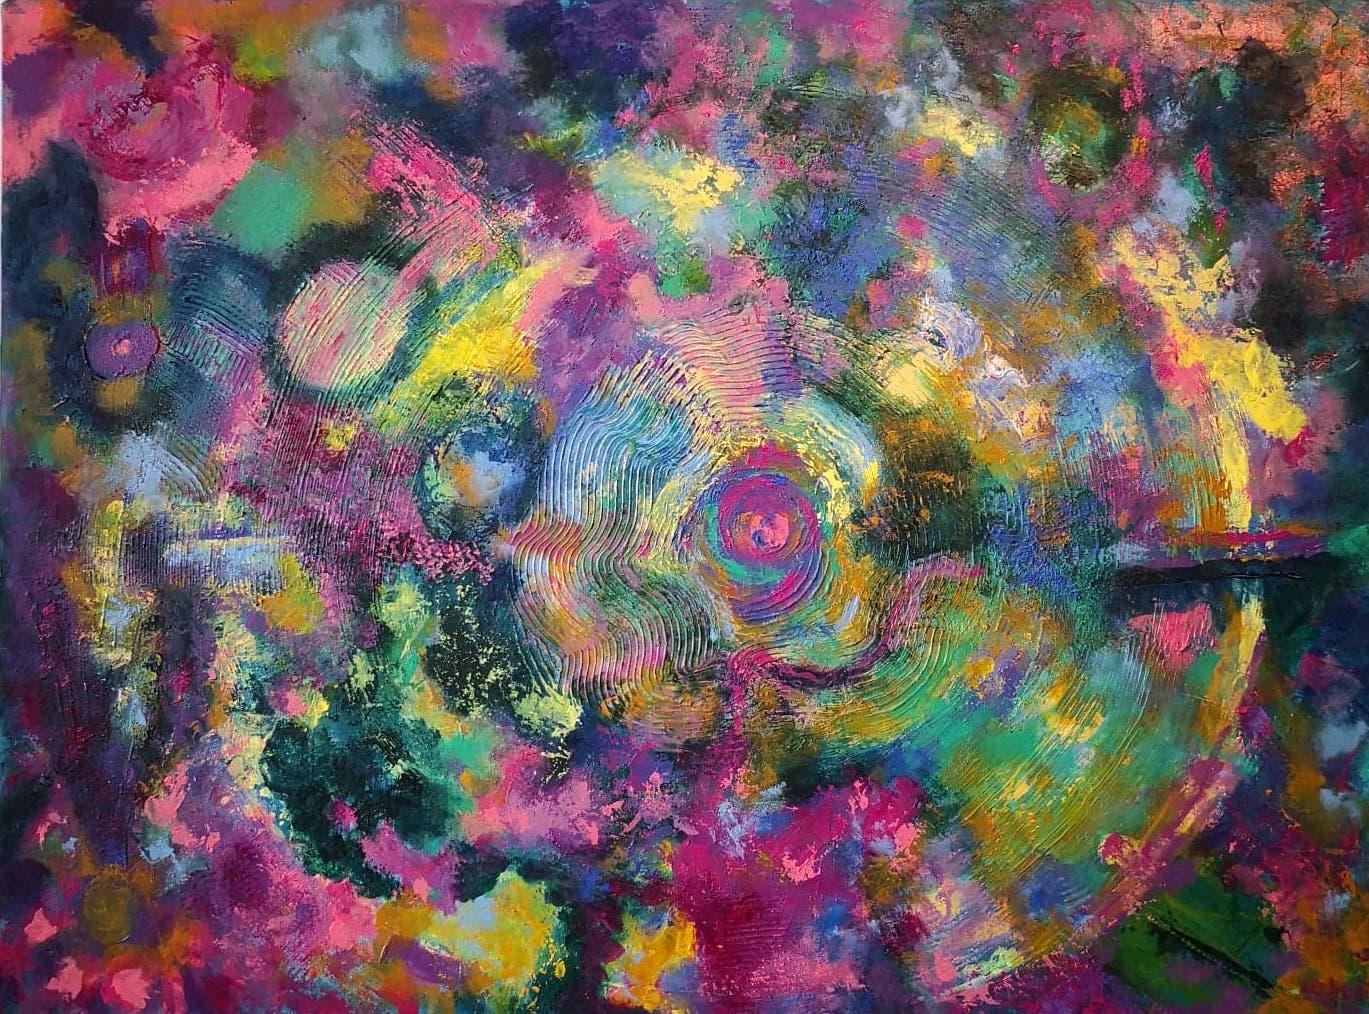 Heather M. Johnson, Vortex, Acrylic on canvas, 18 x 24 inches, $325.jpg